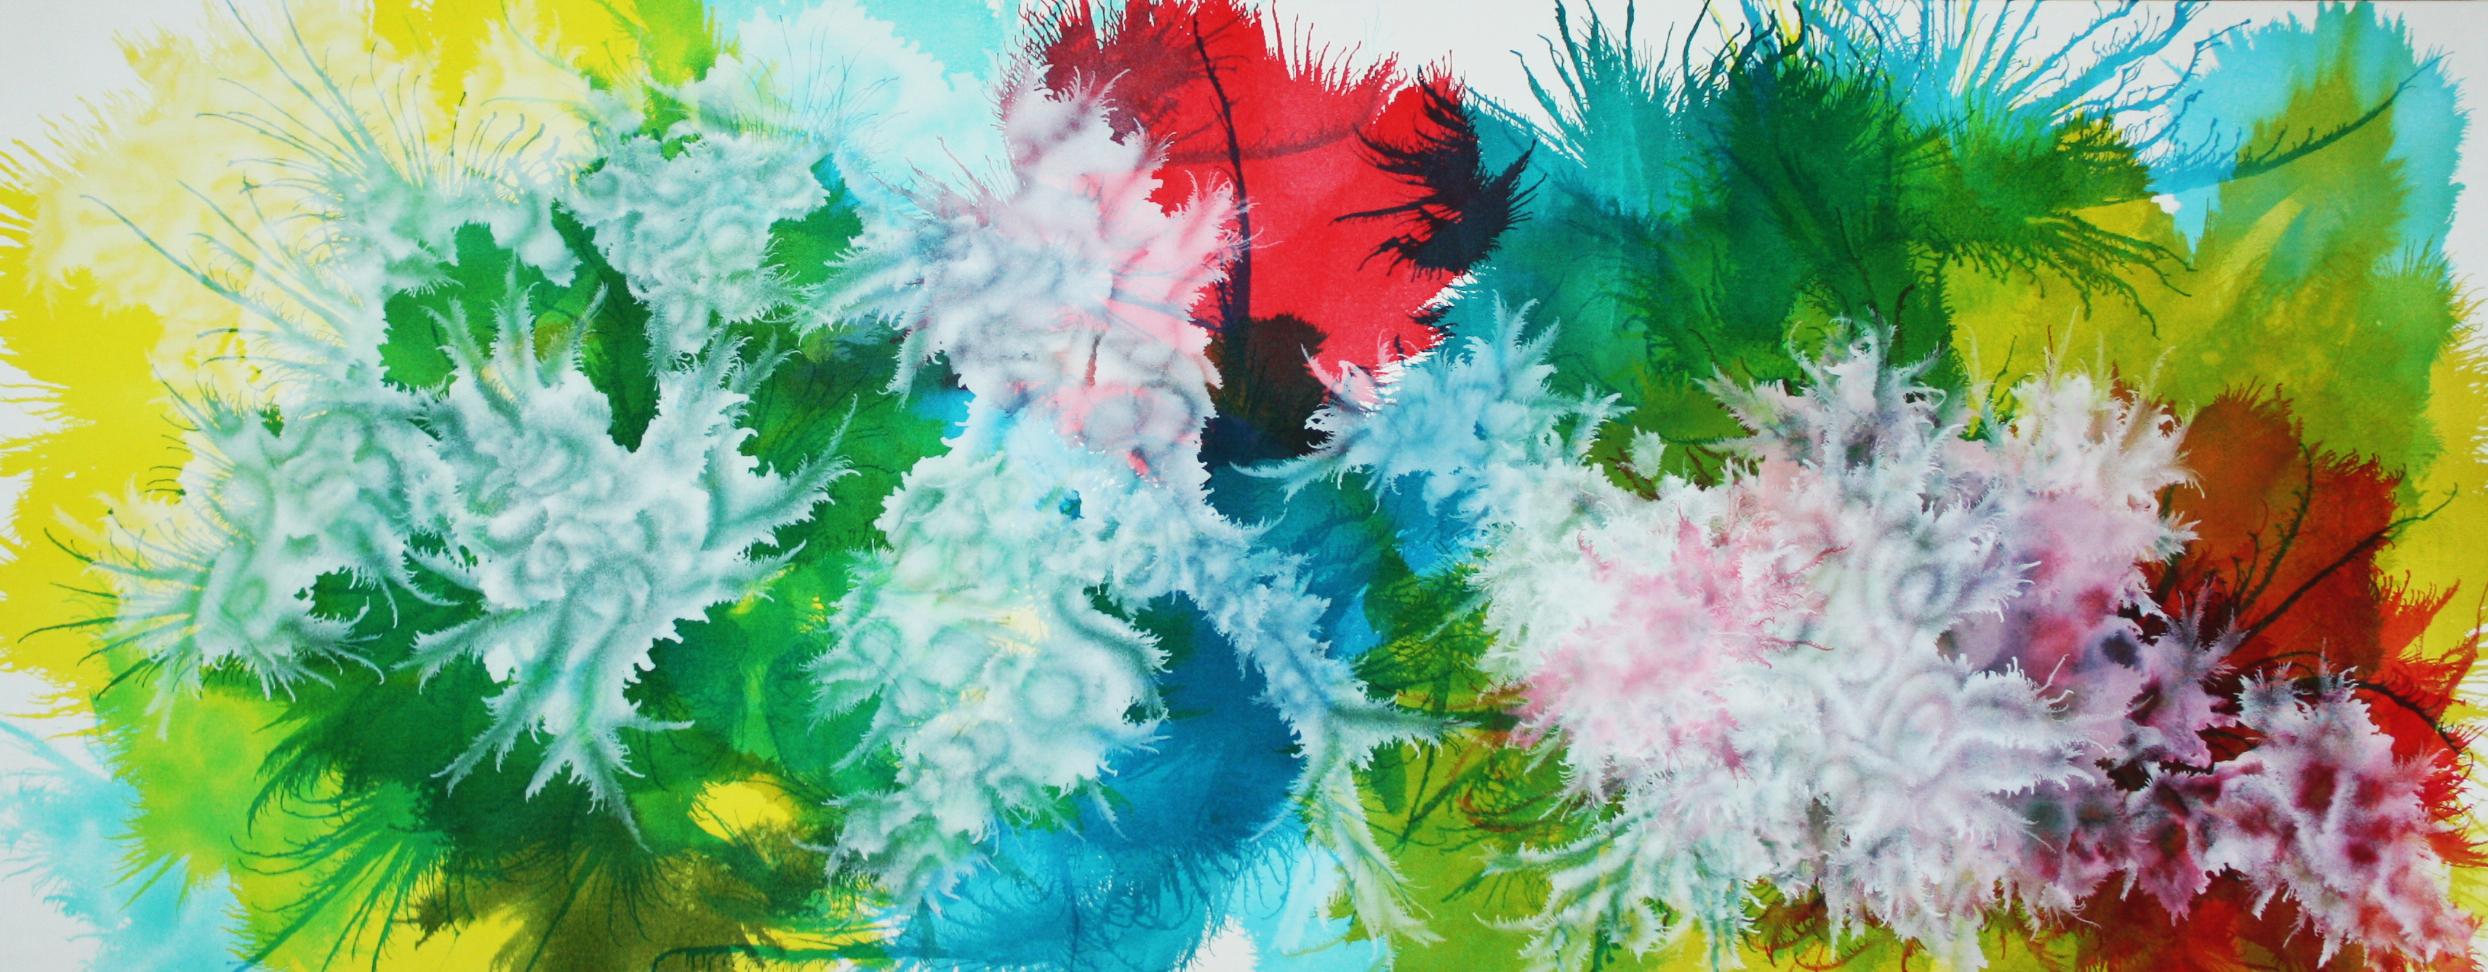 Splendour Island by Mia Farizza 80x200cm.jpg